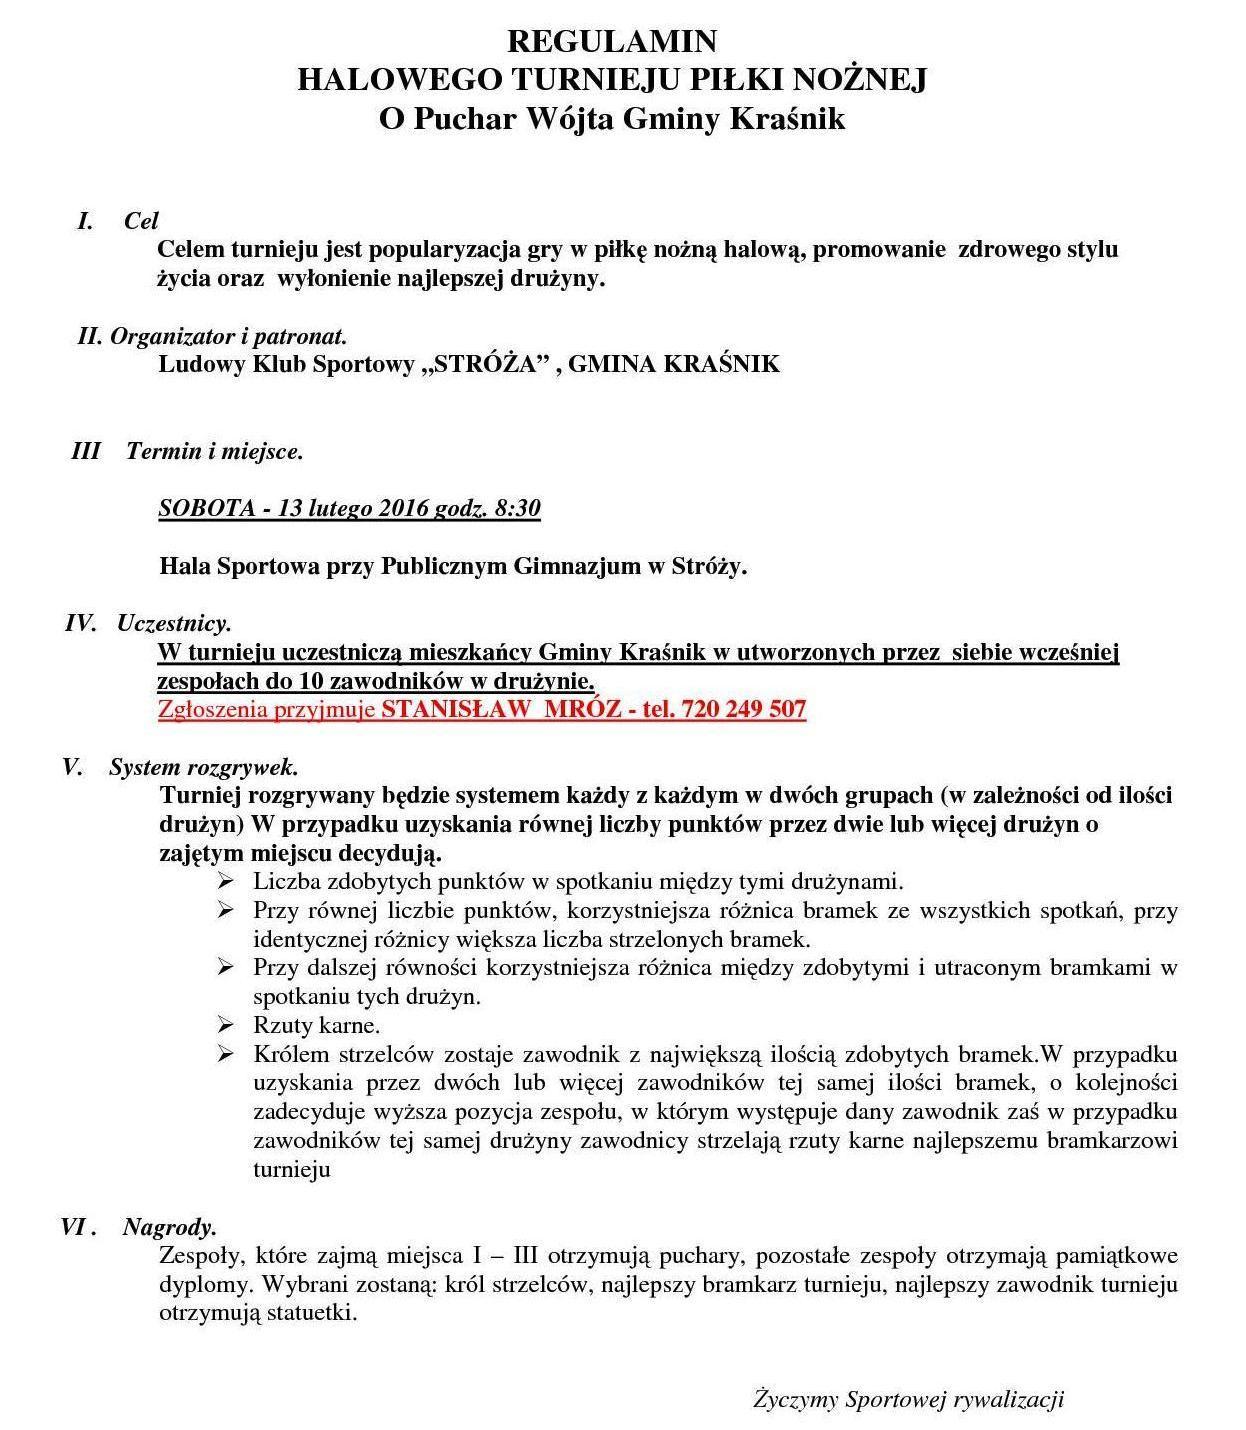 Regulamin Puchar Wójta Gminy Kraśnik1